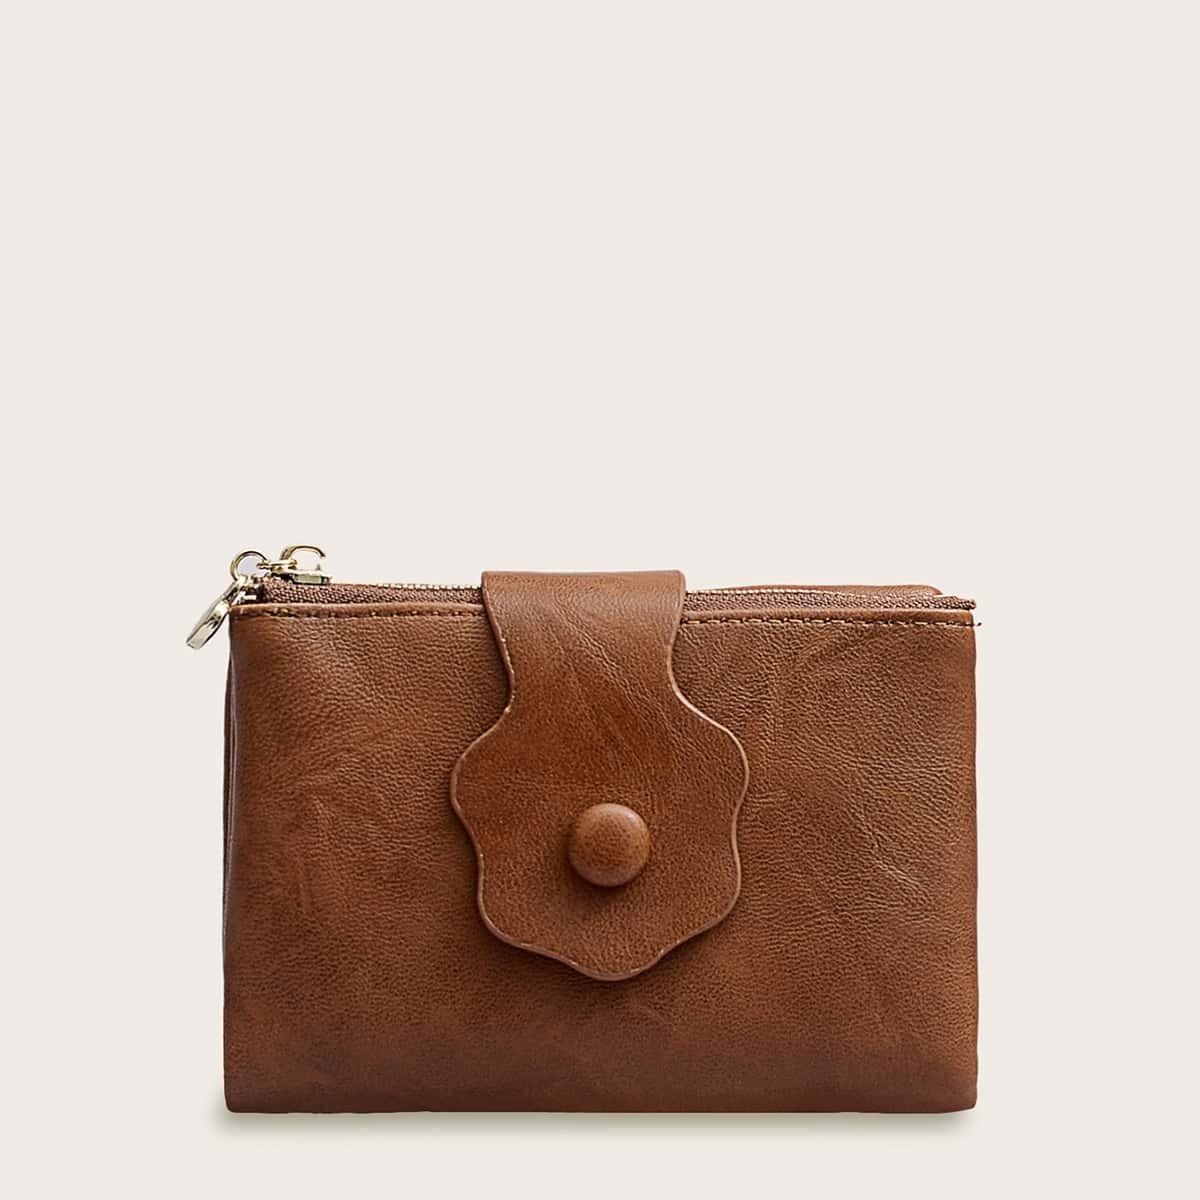 Сложите кошелек с держателем карты от SHEIN